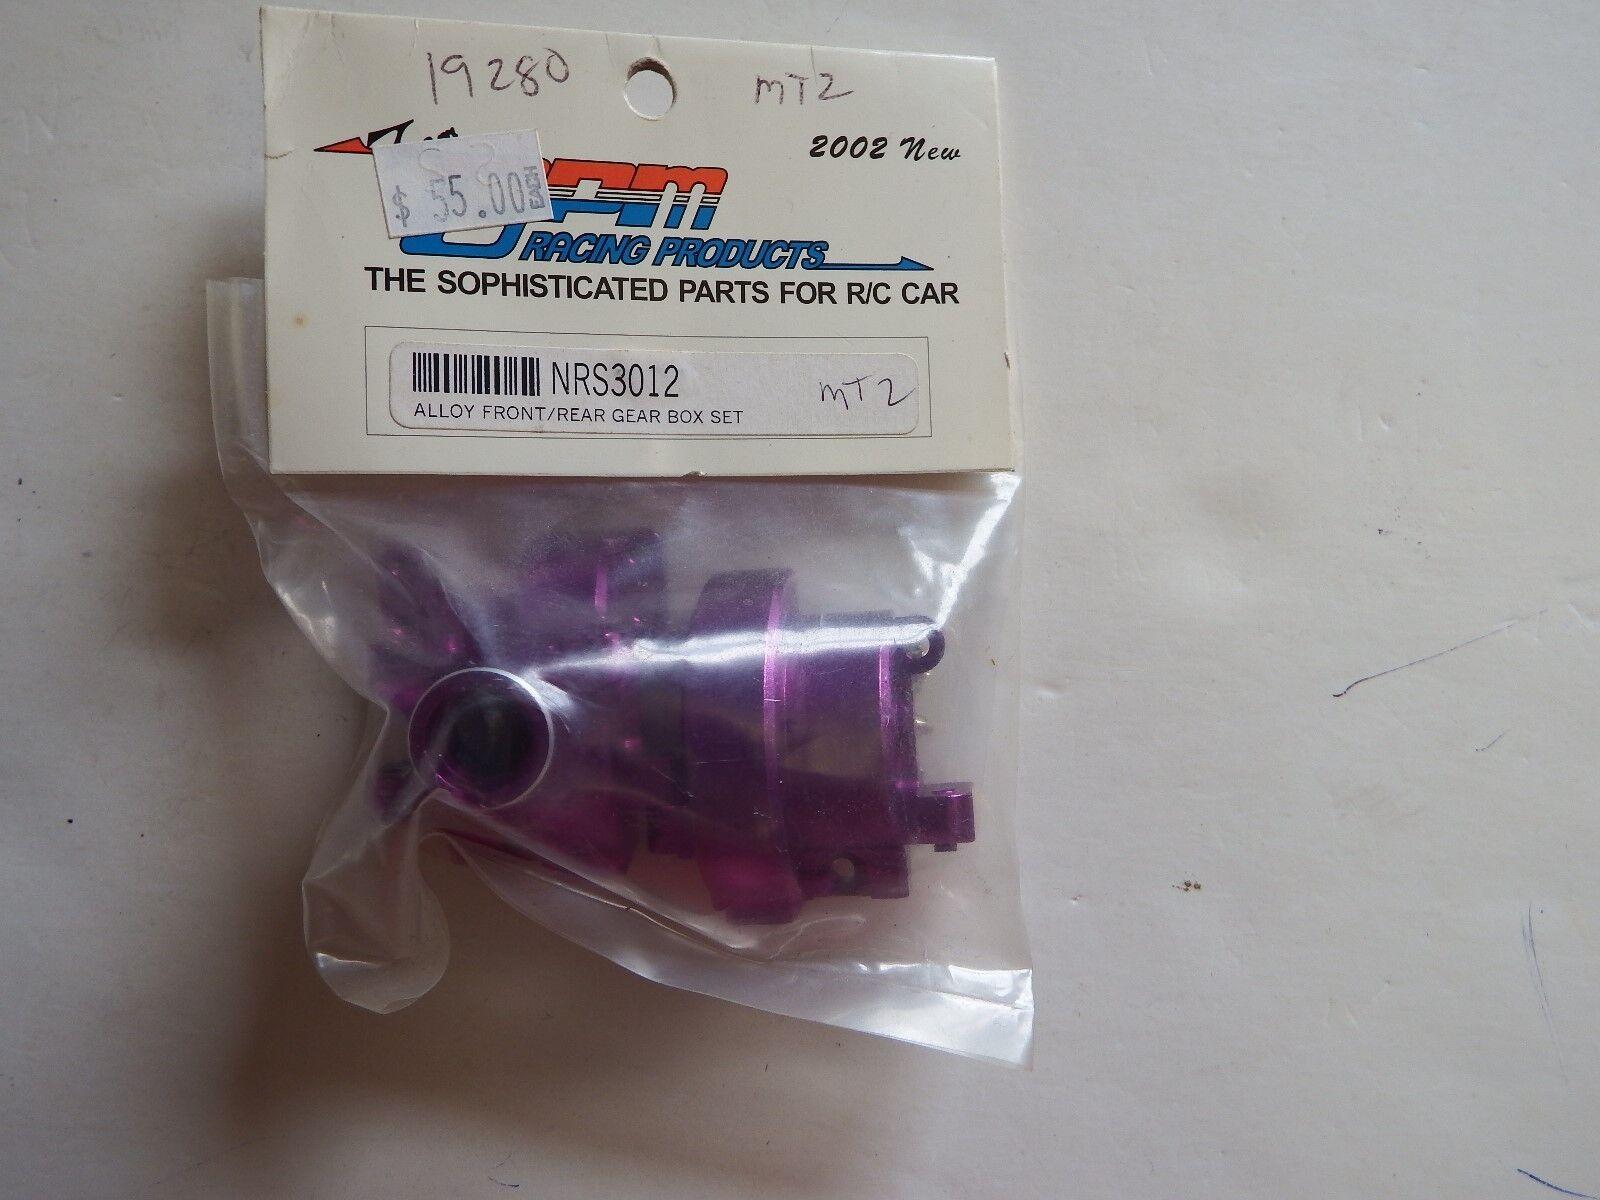 GPM Racing - púrpura ALLOY FRONT REAR GEAR BOX SET - Model  NRS3012